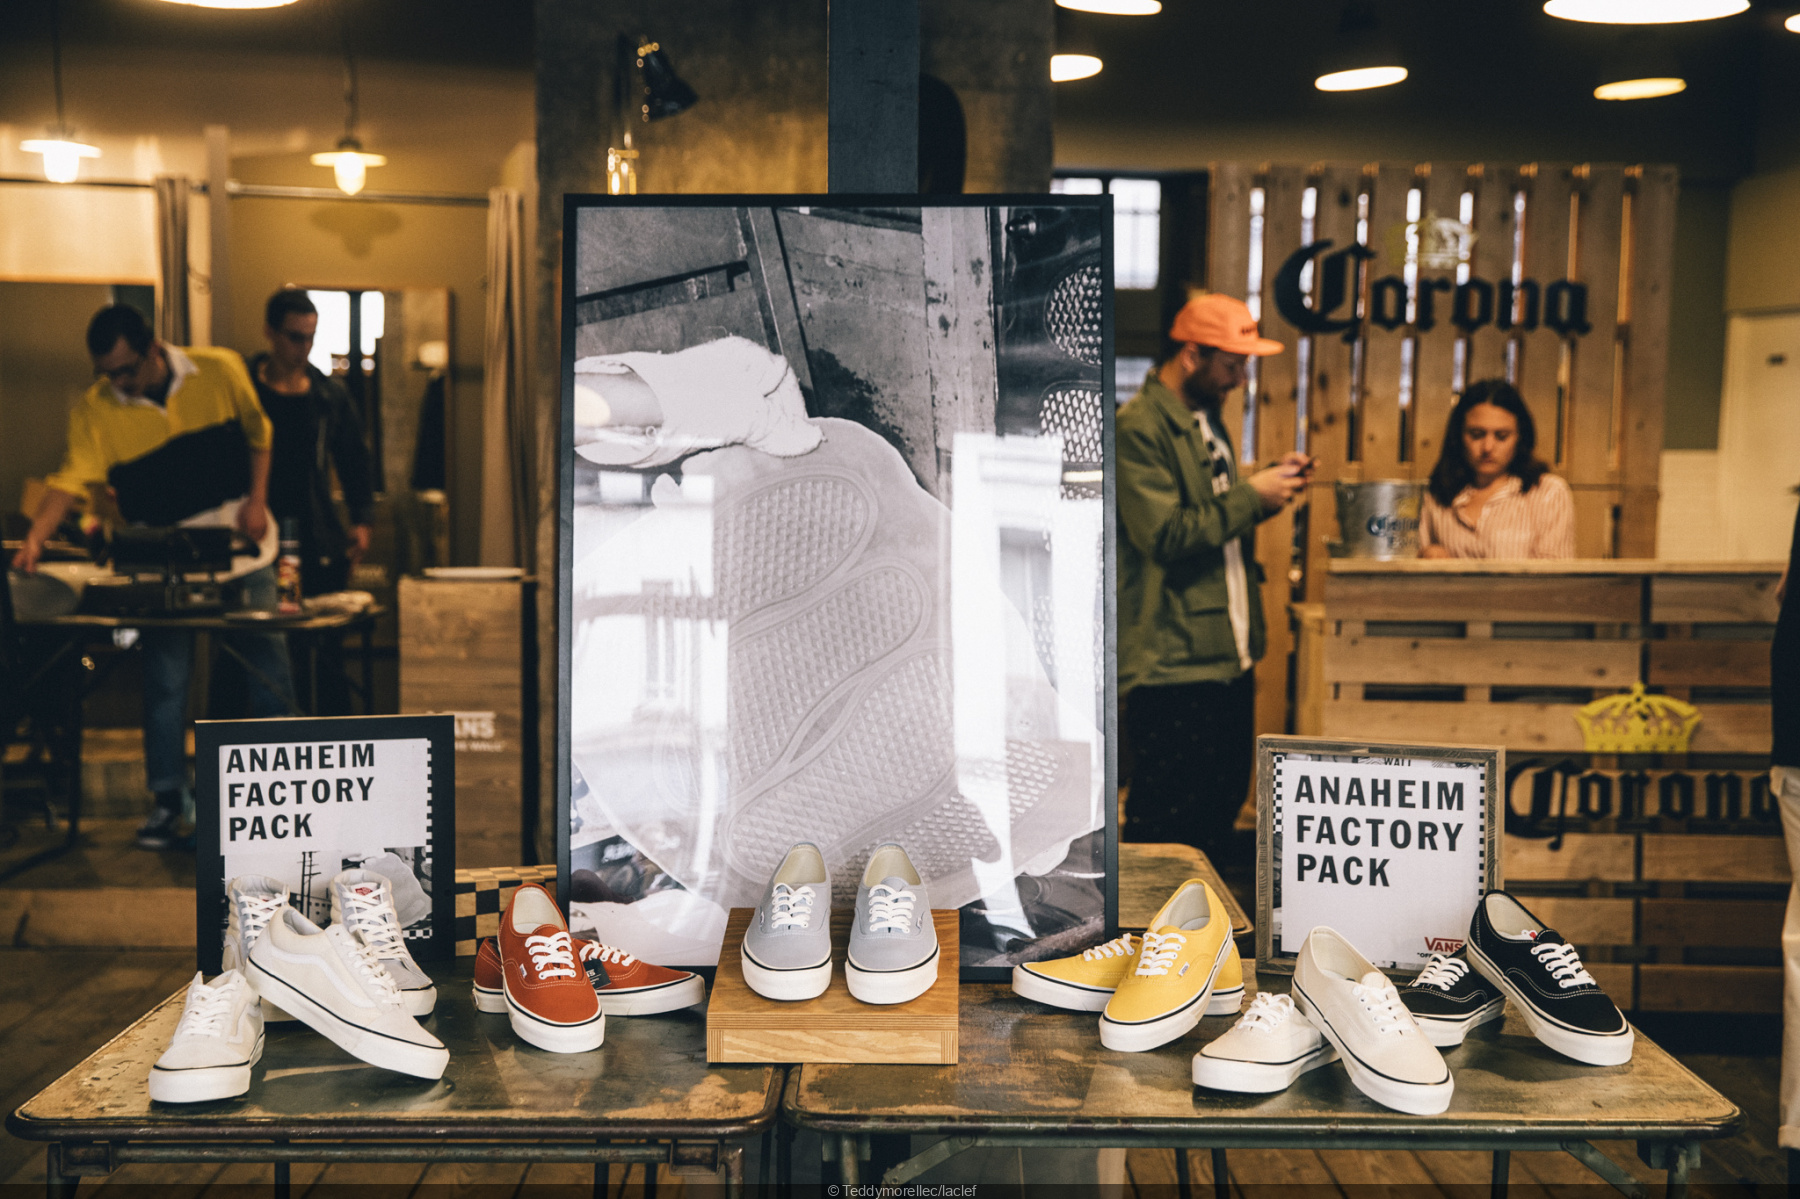 Vans dévoile sa collection Anaheim Factory Pack